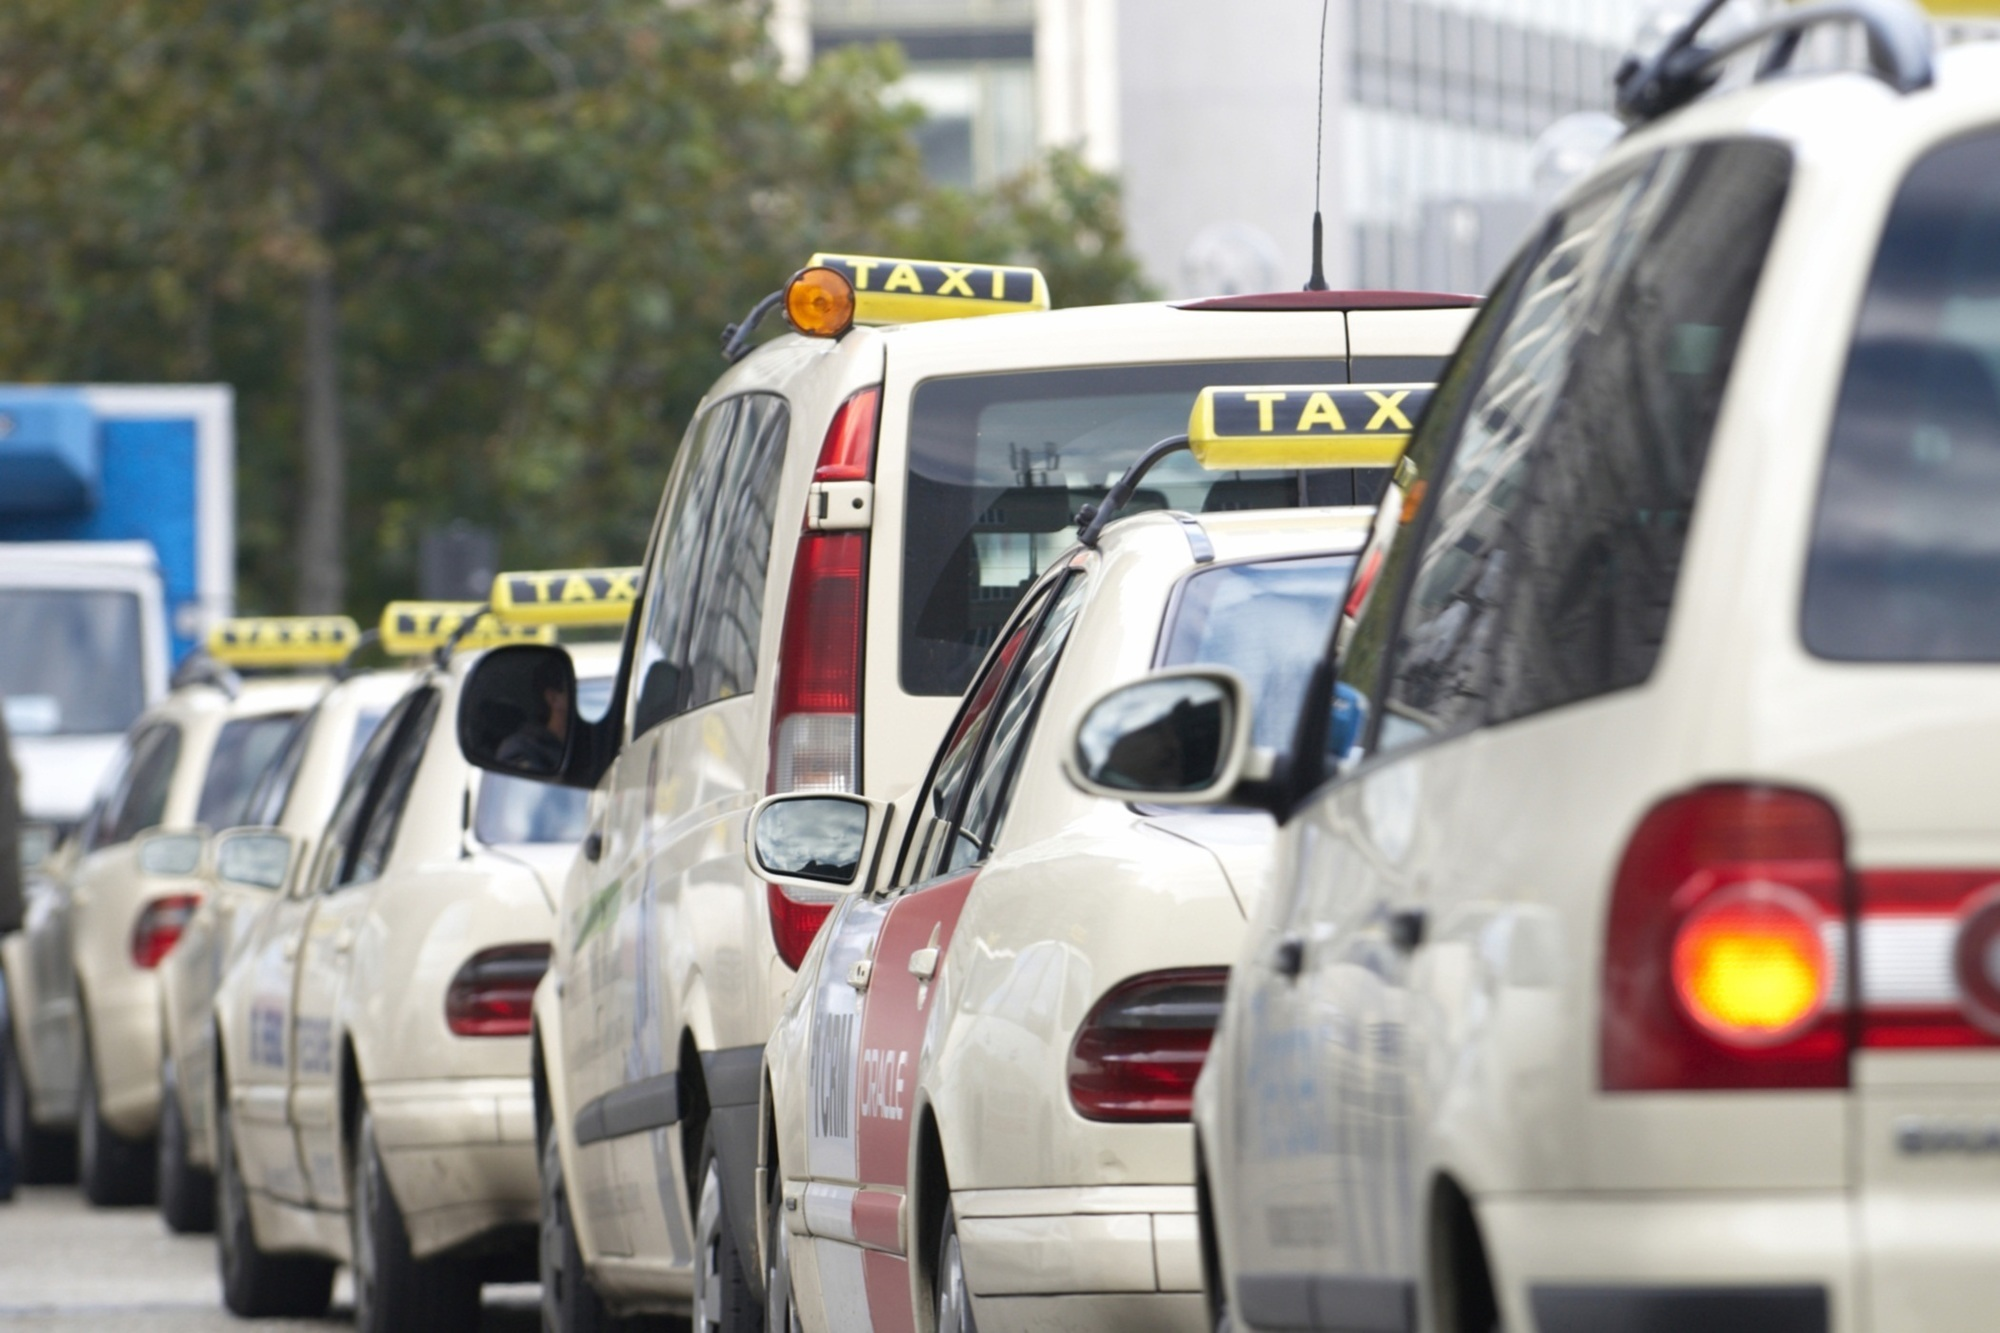 Manipulationen am Rußfilter - Taxis unter Verdacht